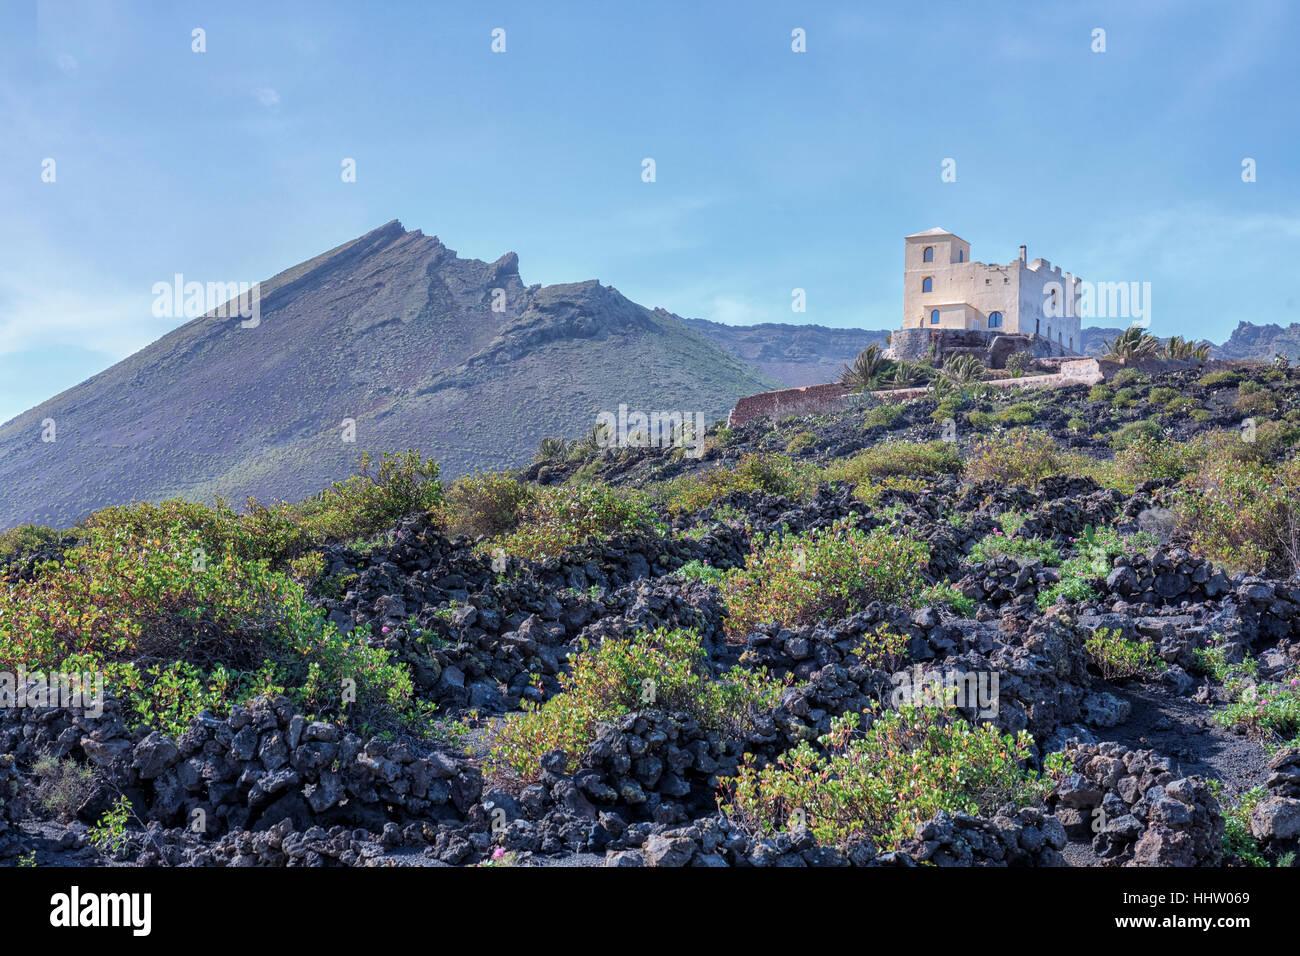 Monto Corona, Haria, Lanzarote, Canary Islands, Spain - Stock Image